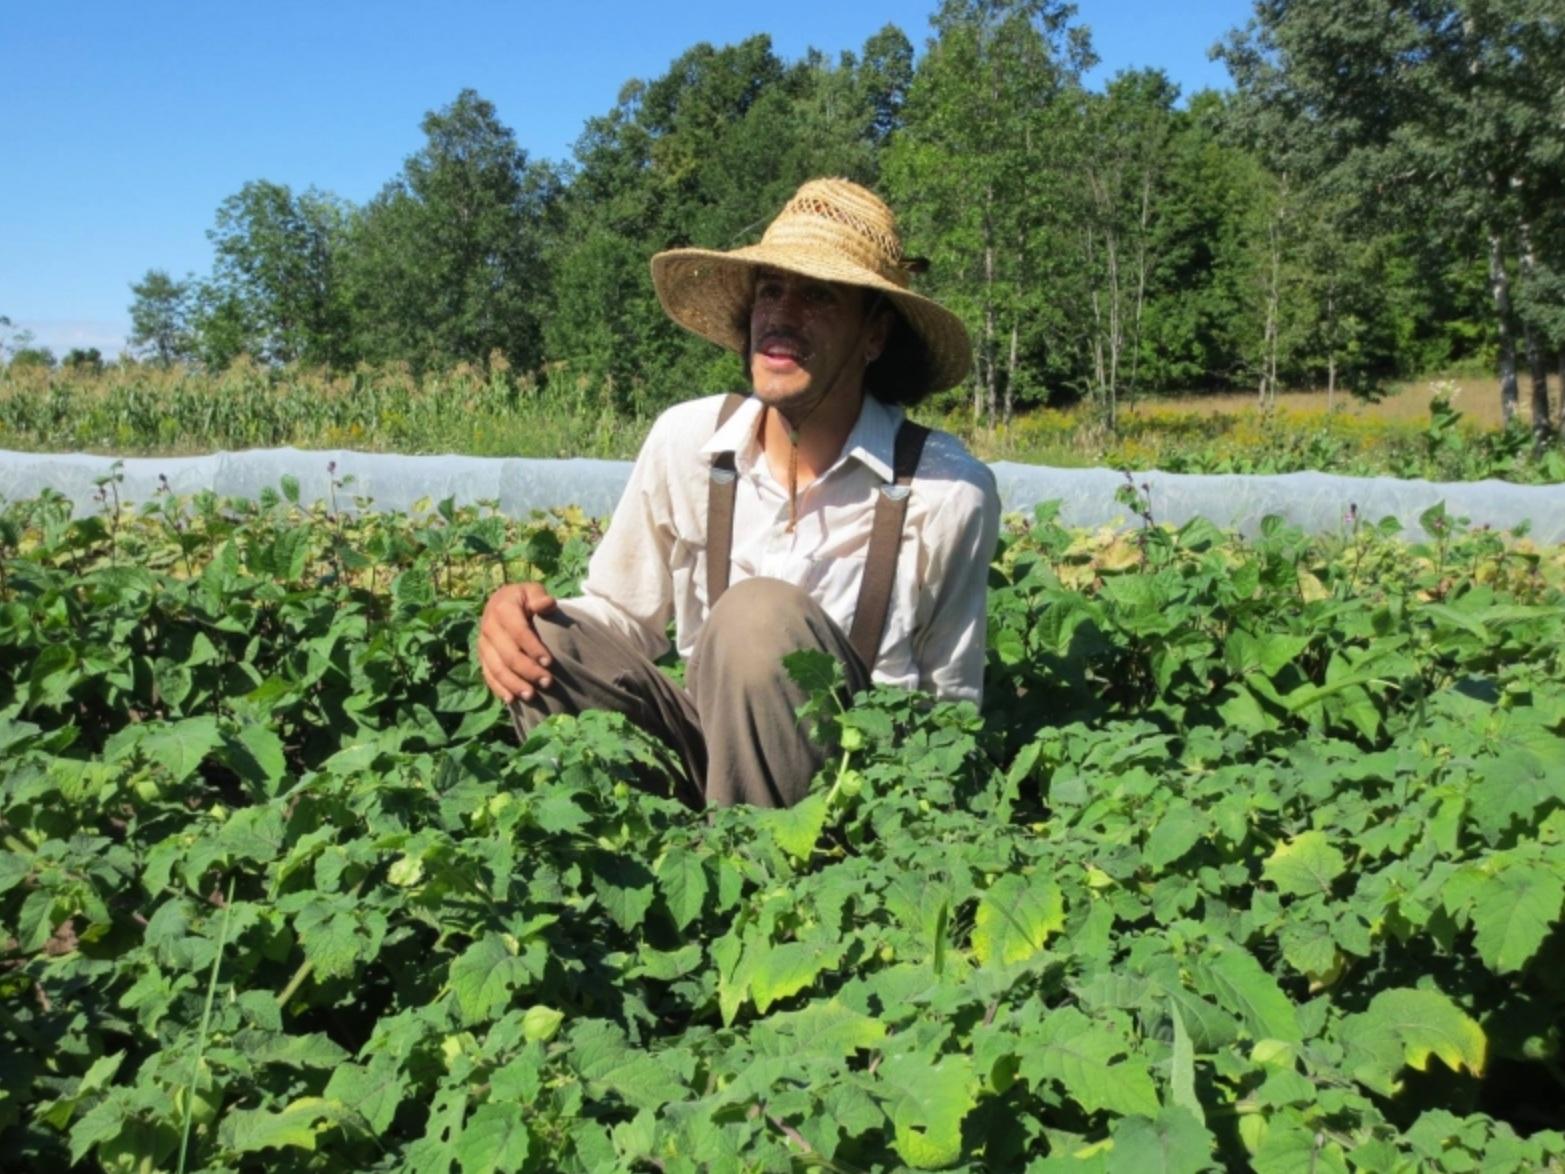 EARTH HAVEN FARM - Creator of biodynamic soil in Tweed, Ontario